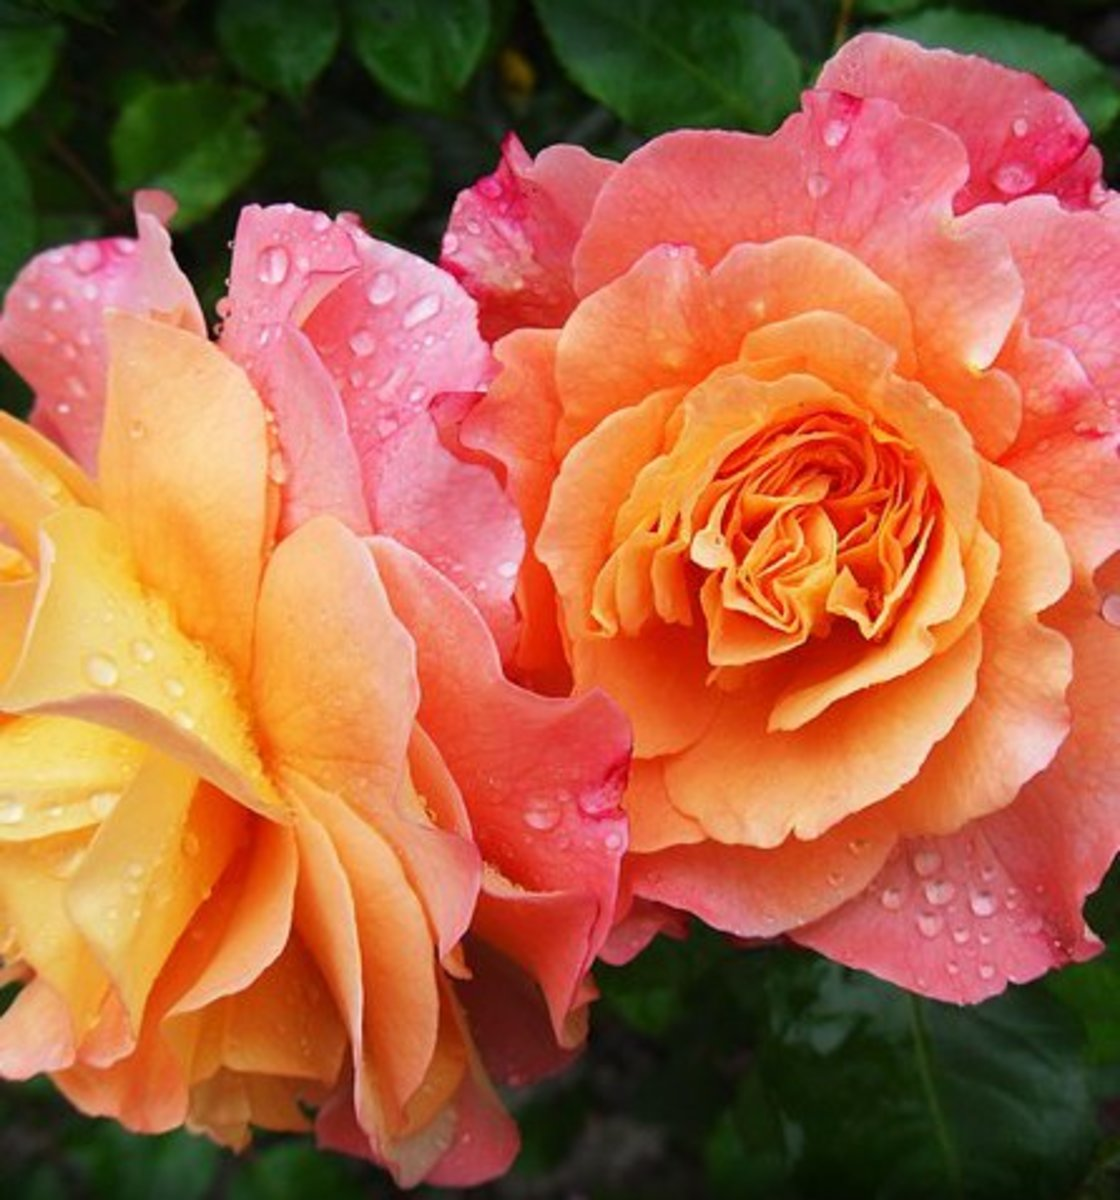 Orange color roses in bloom